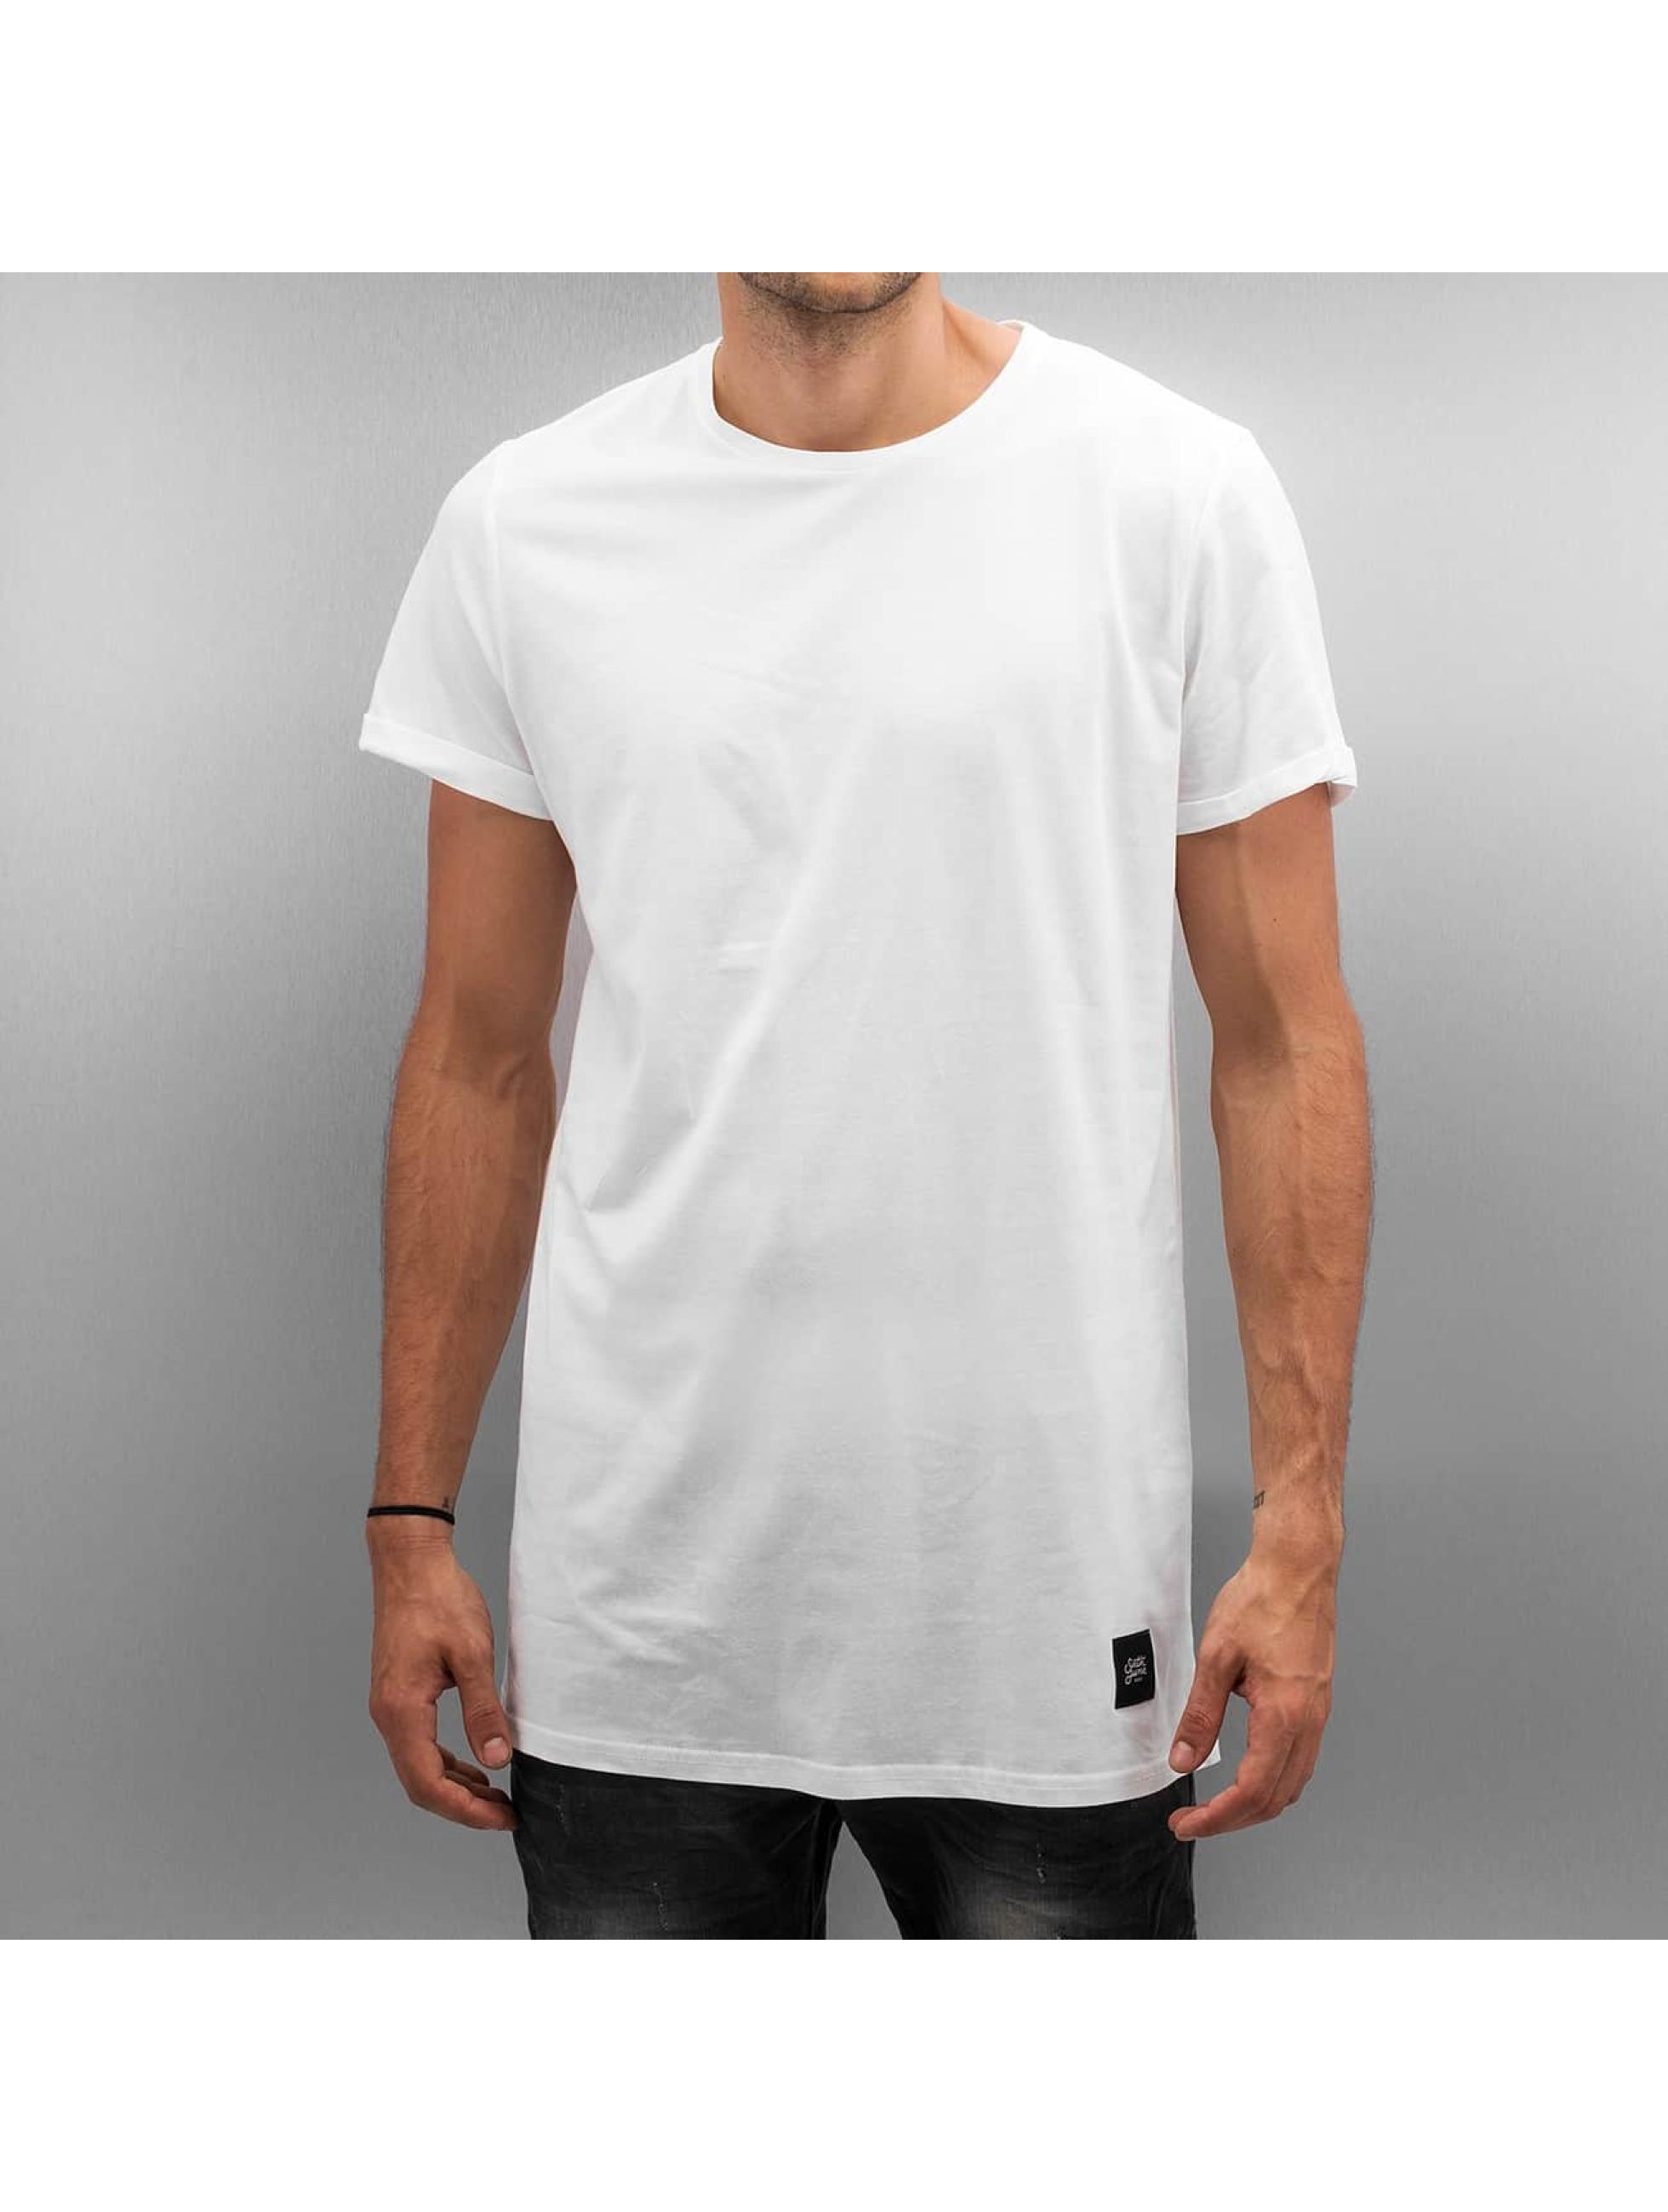 T-Shirt Long in weiß